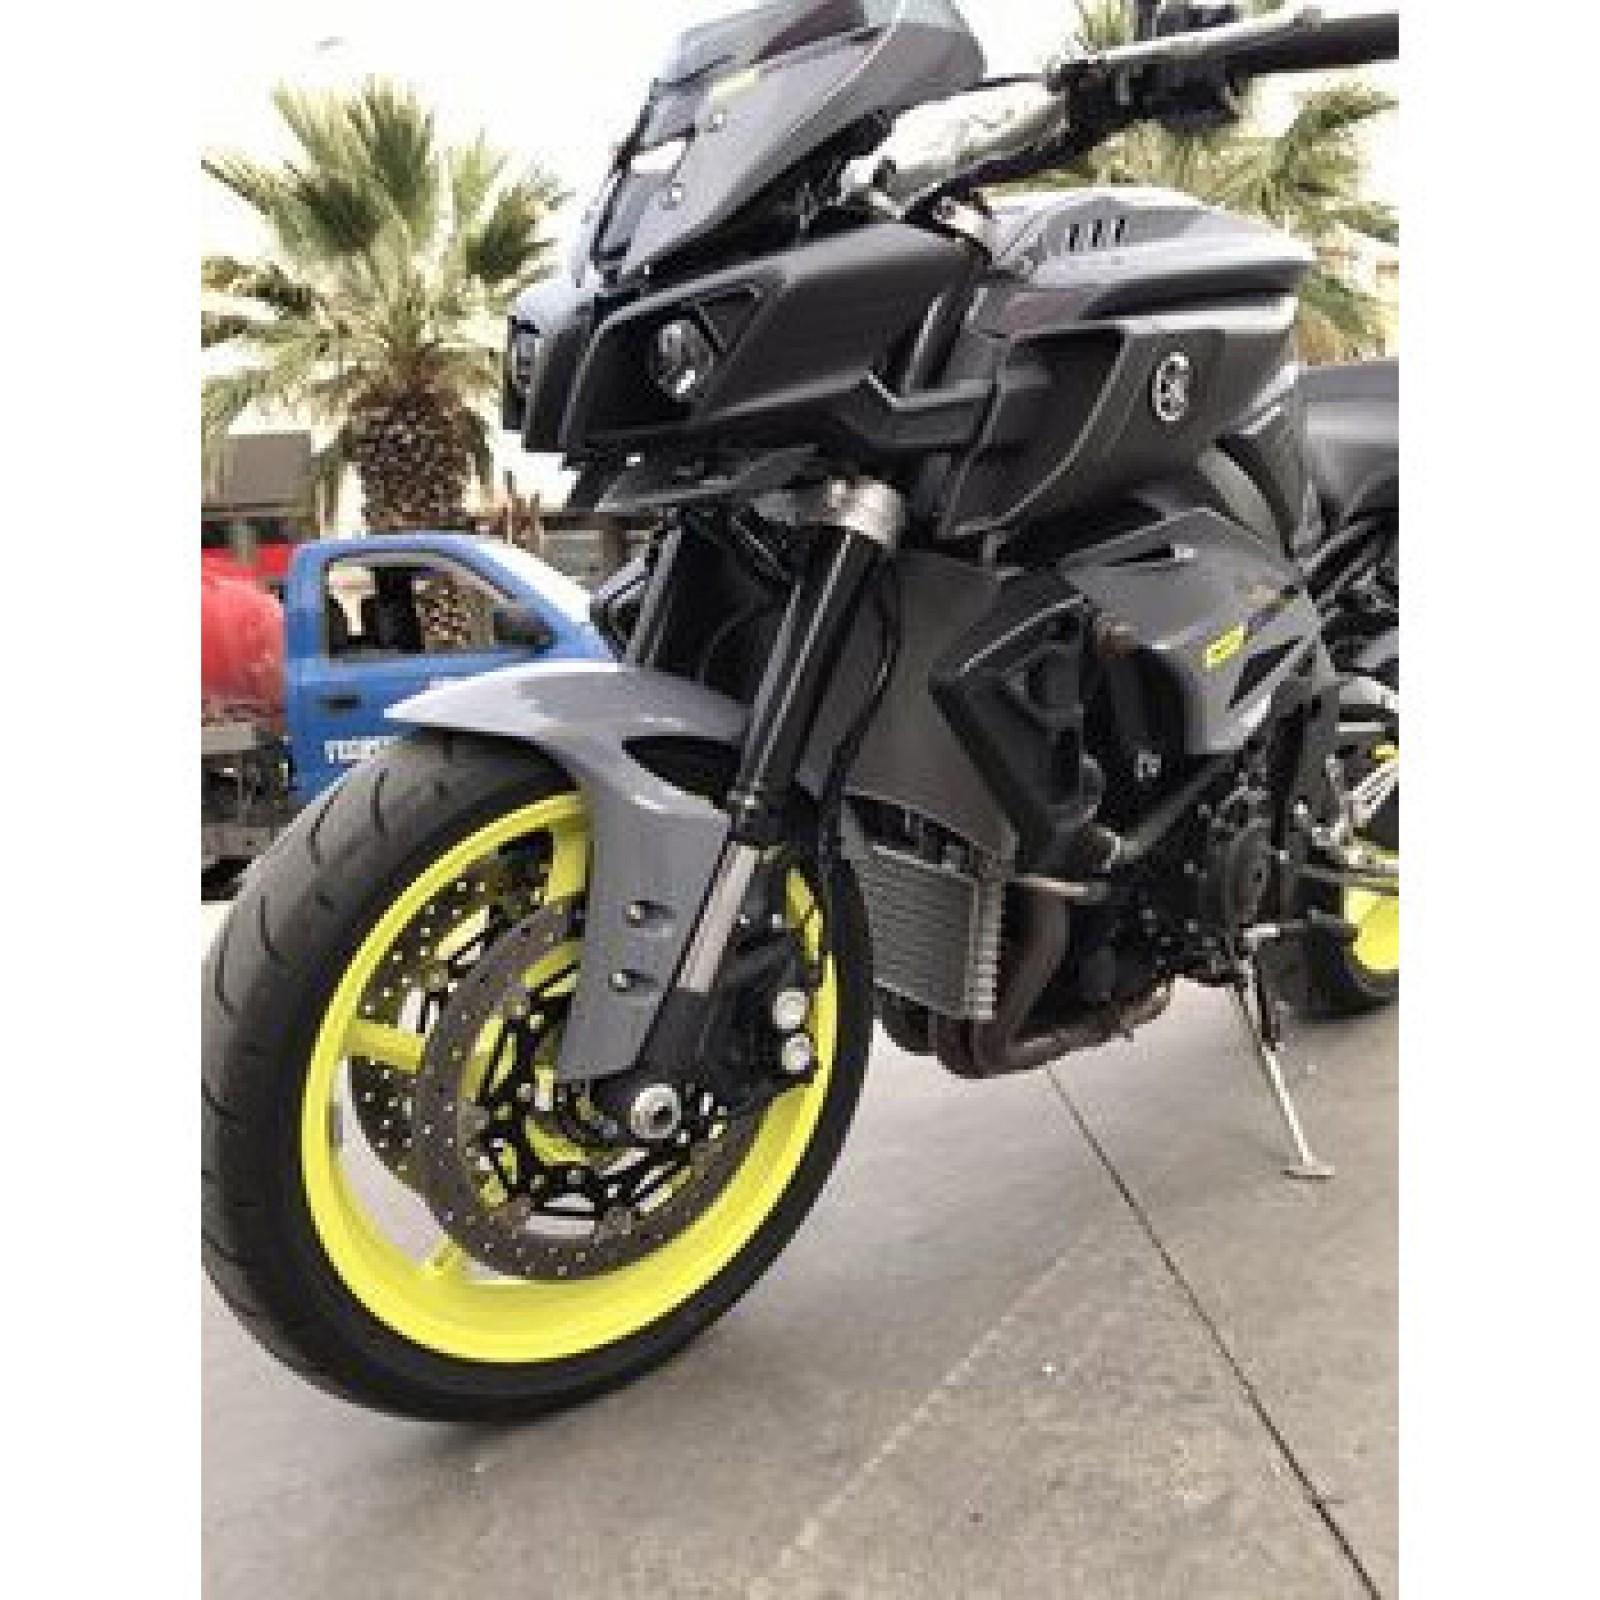 Yamaha MT-10 '17